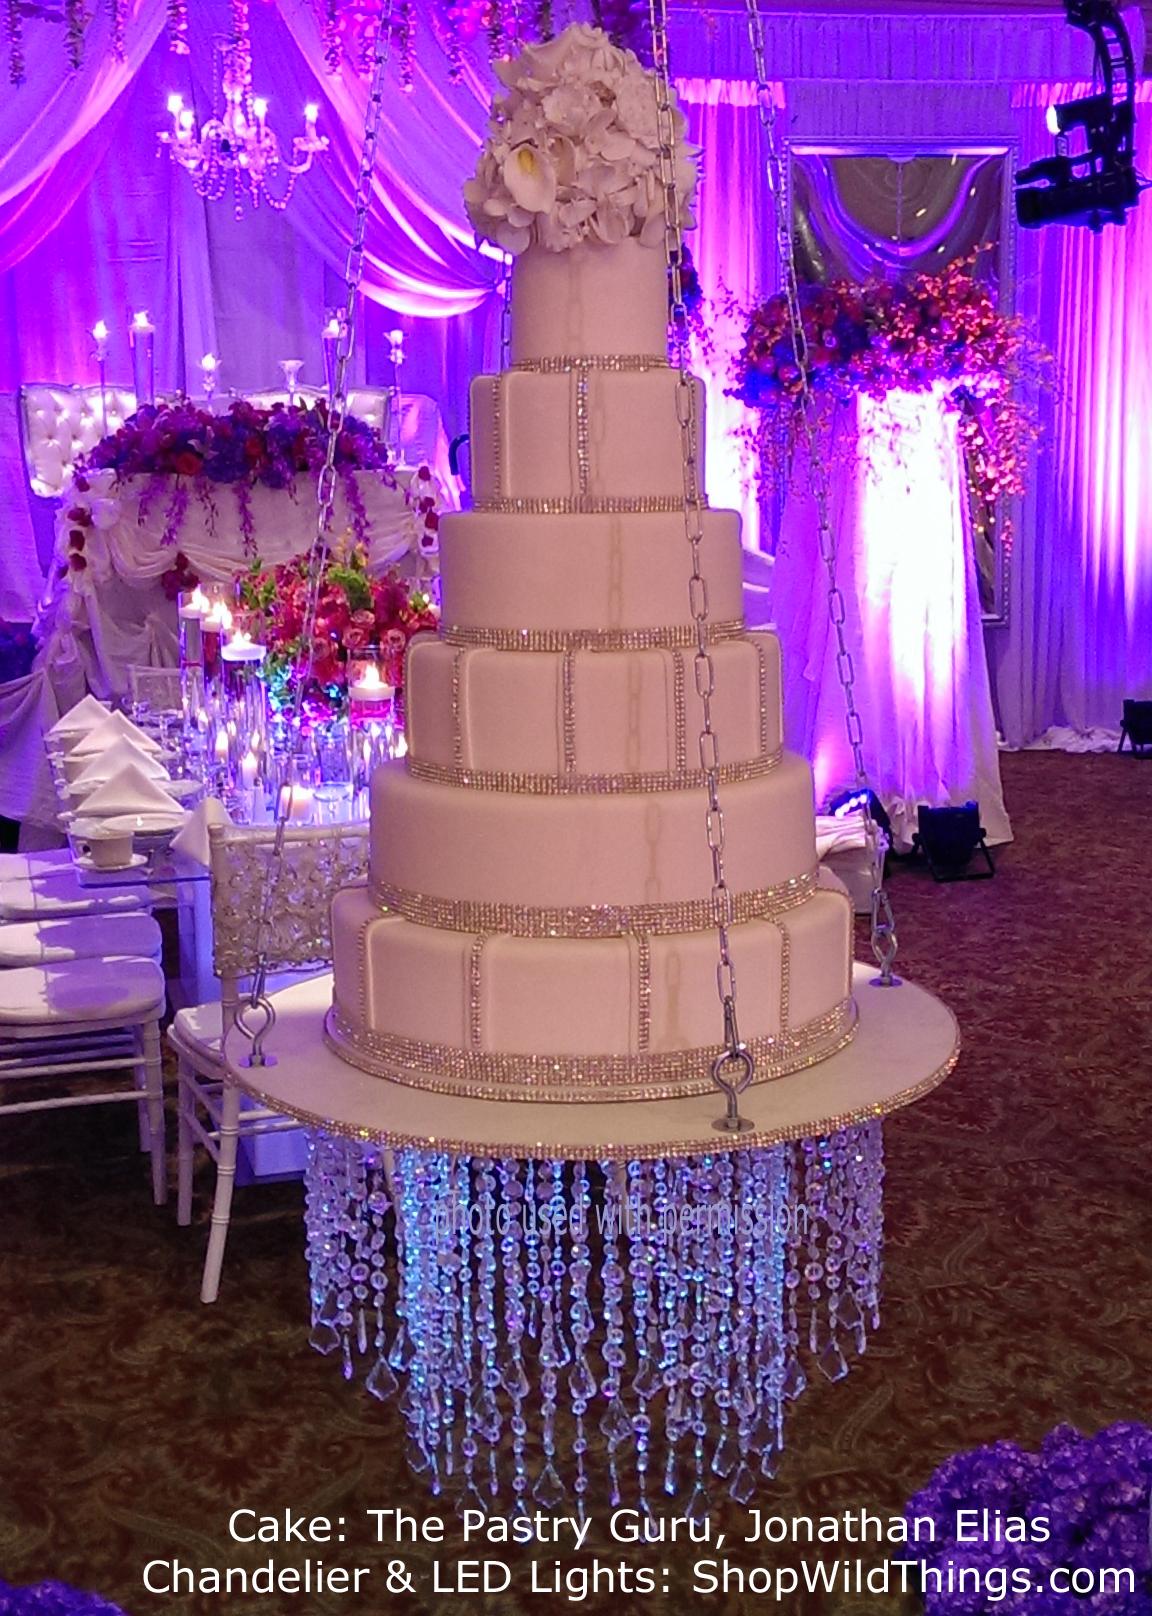 Hanging Wedding Cake - With Chandelier Underneath!